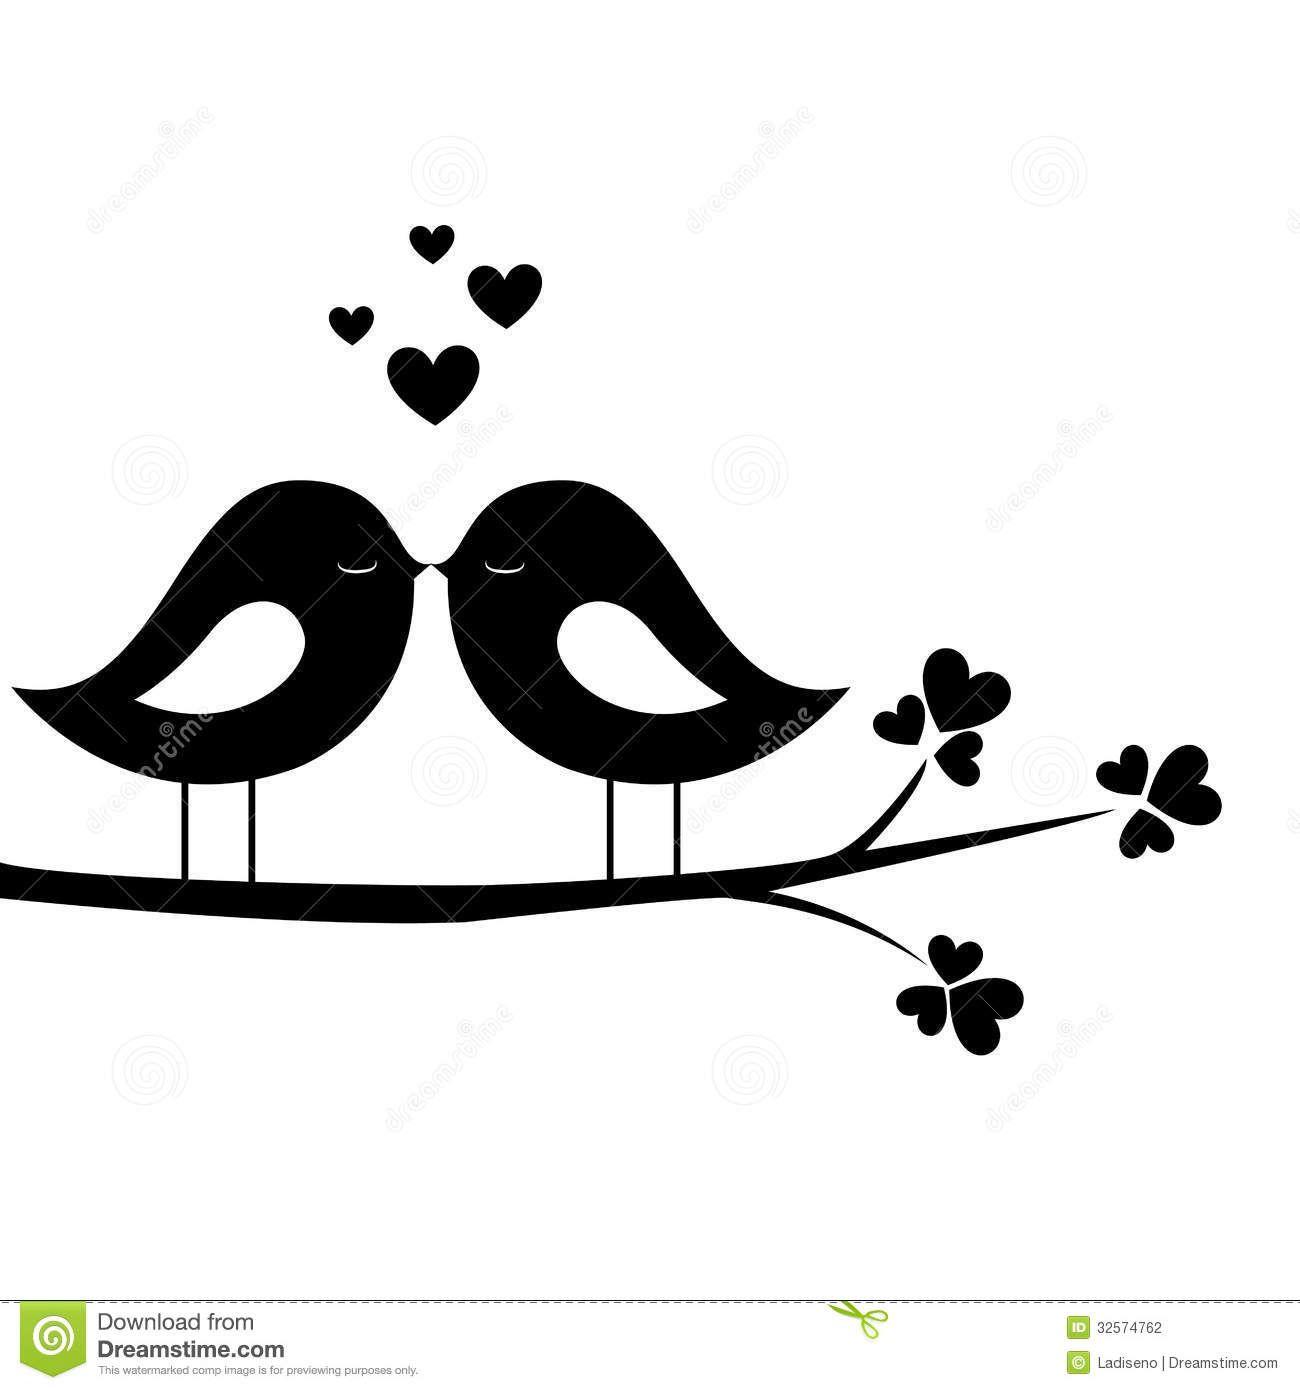 Love Birds Clipart Black - ClipartFest-Love birds clipart black - ClipartFest-2